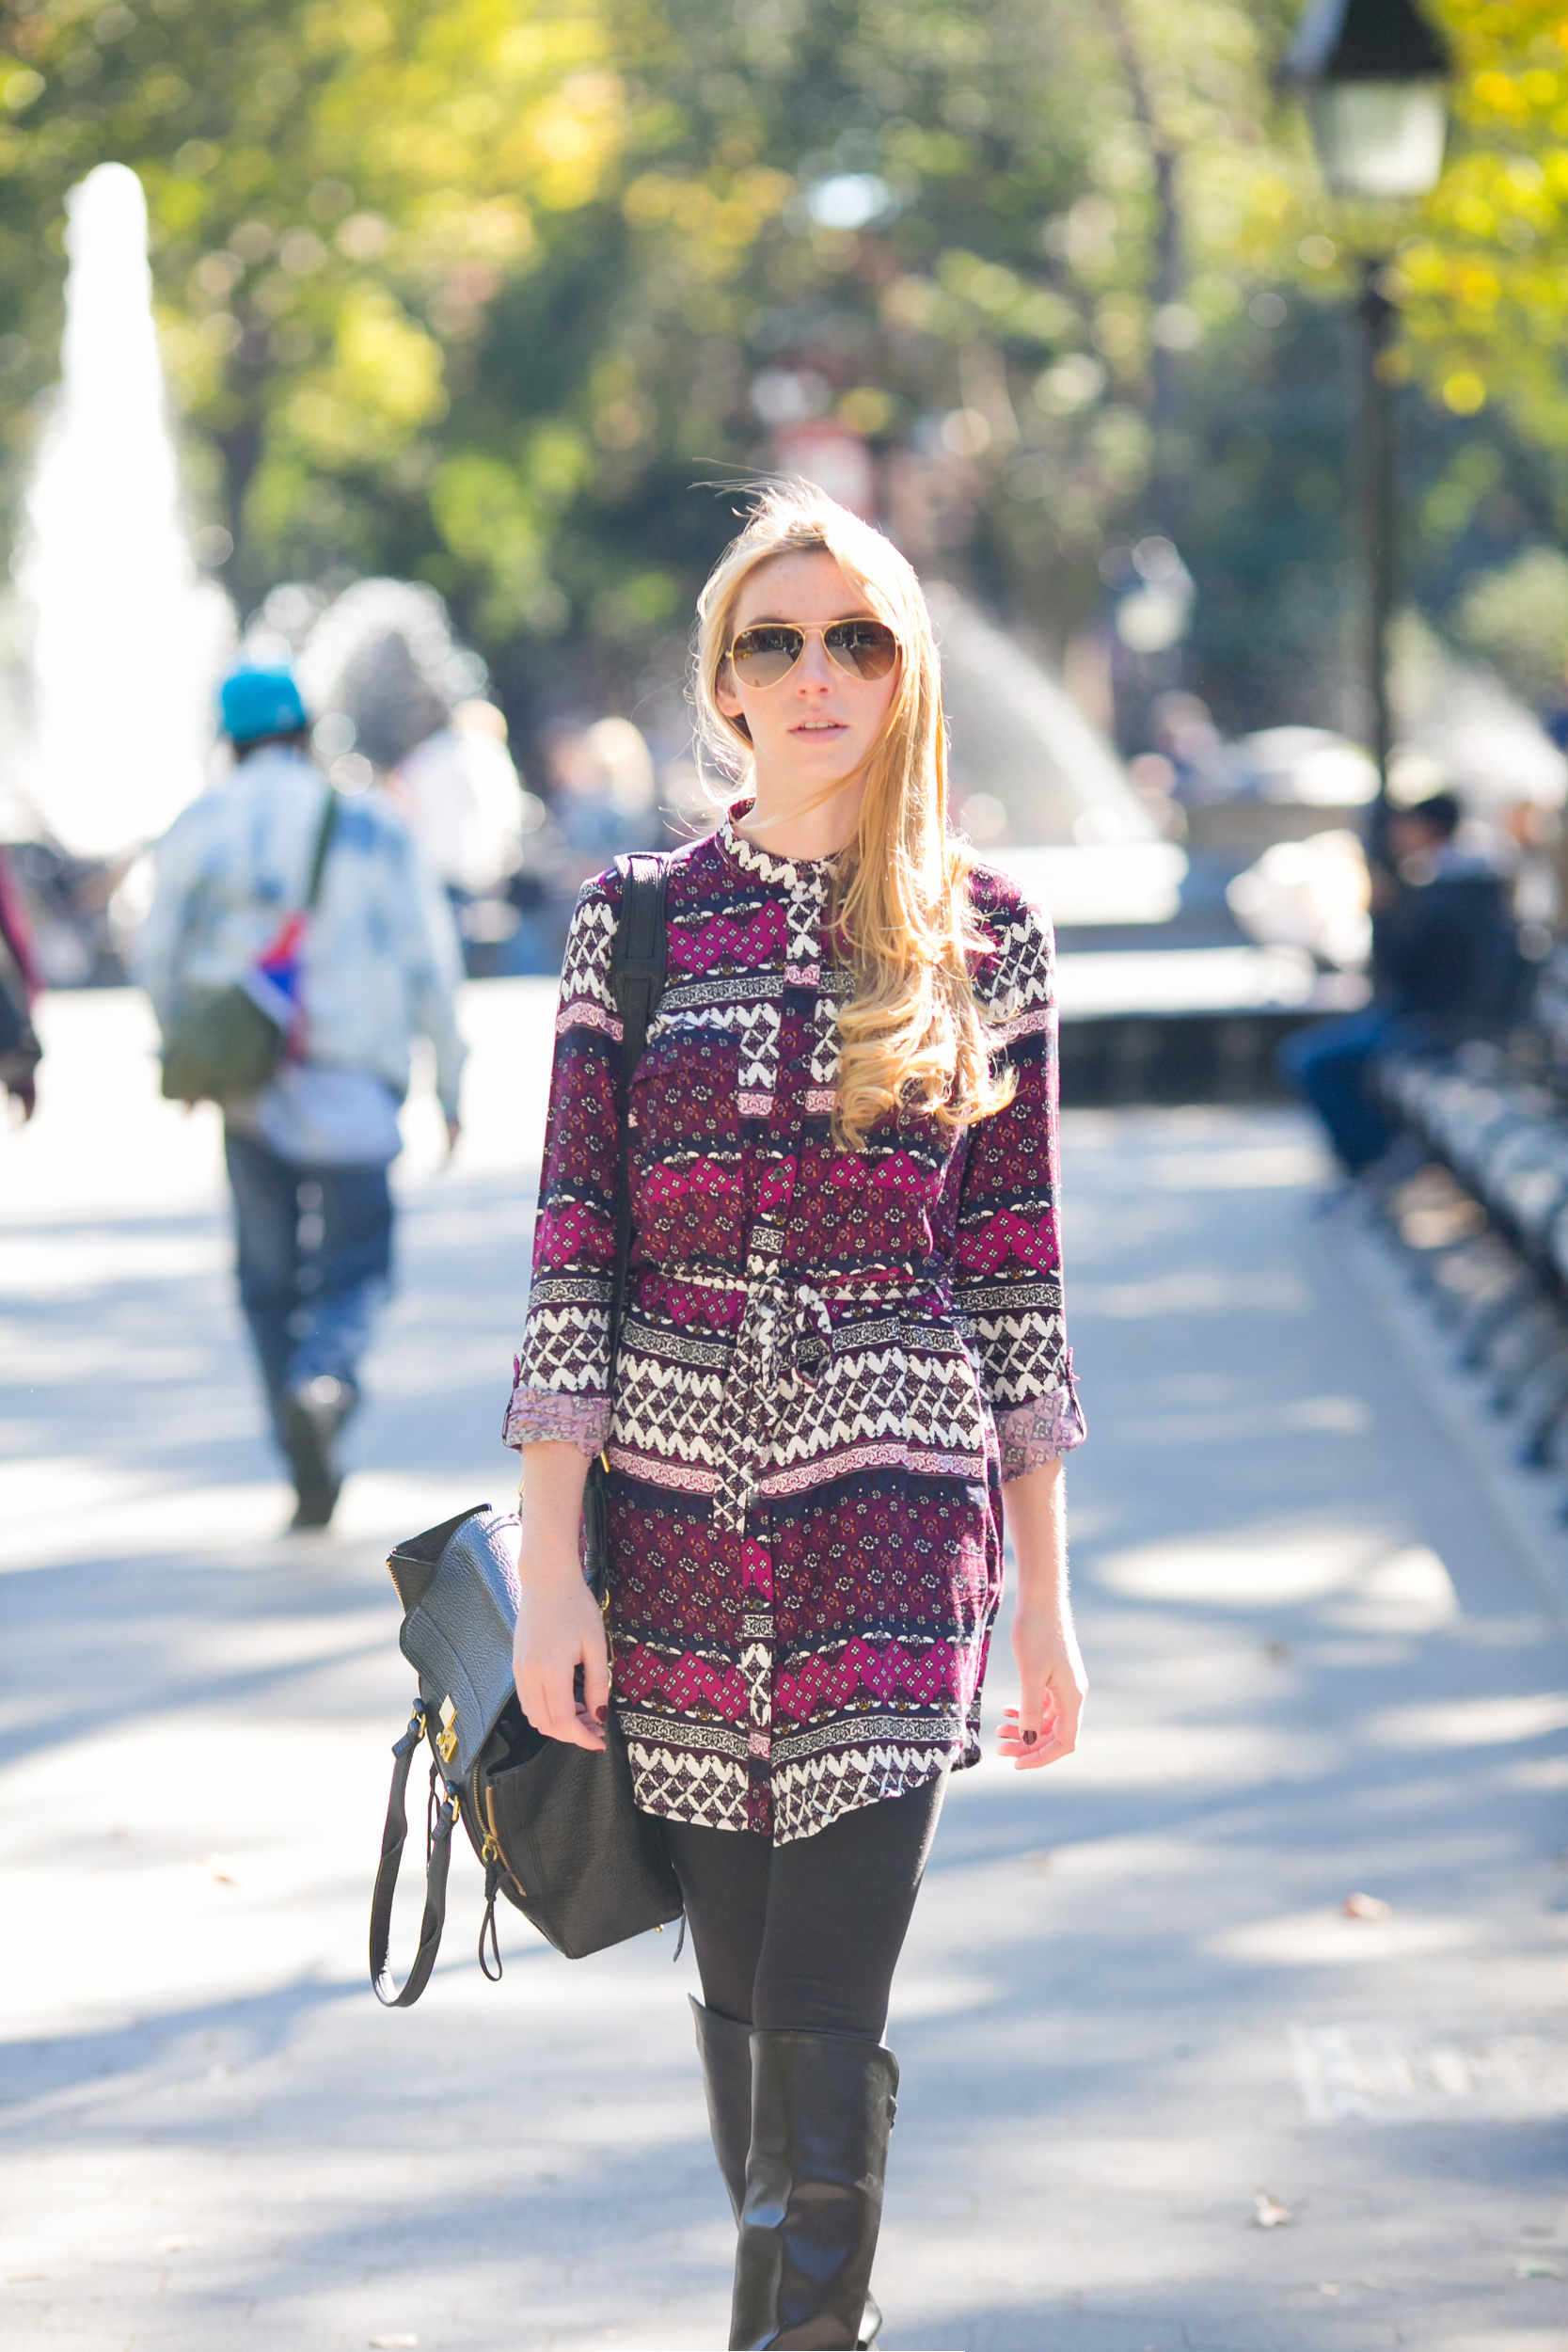 Fall Street Style (via Girl x Garment)